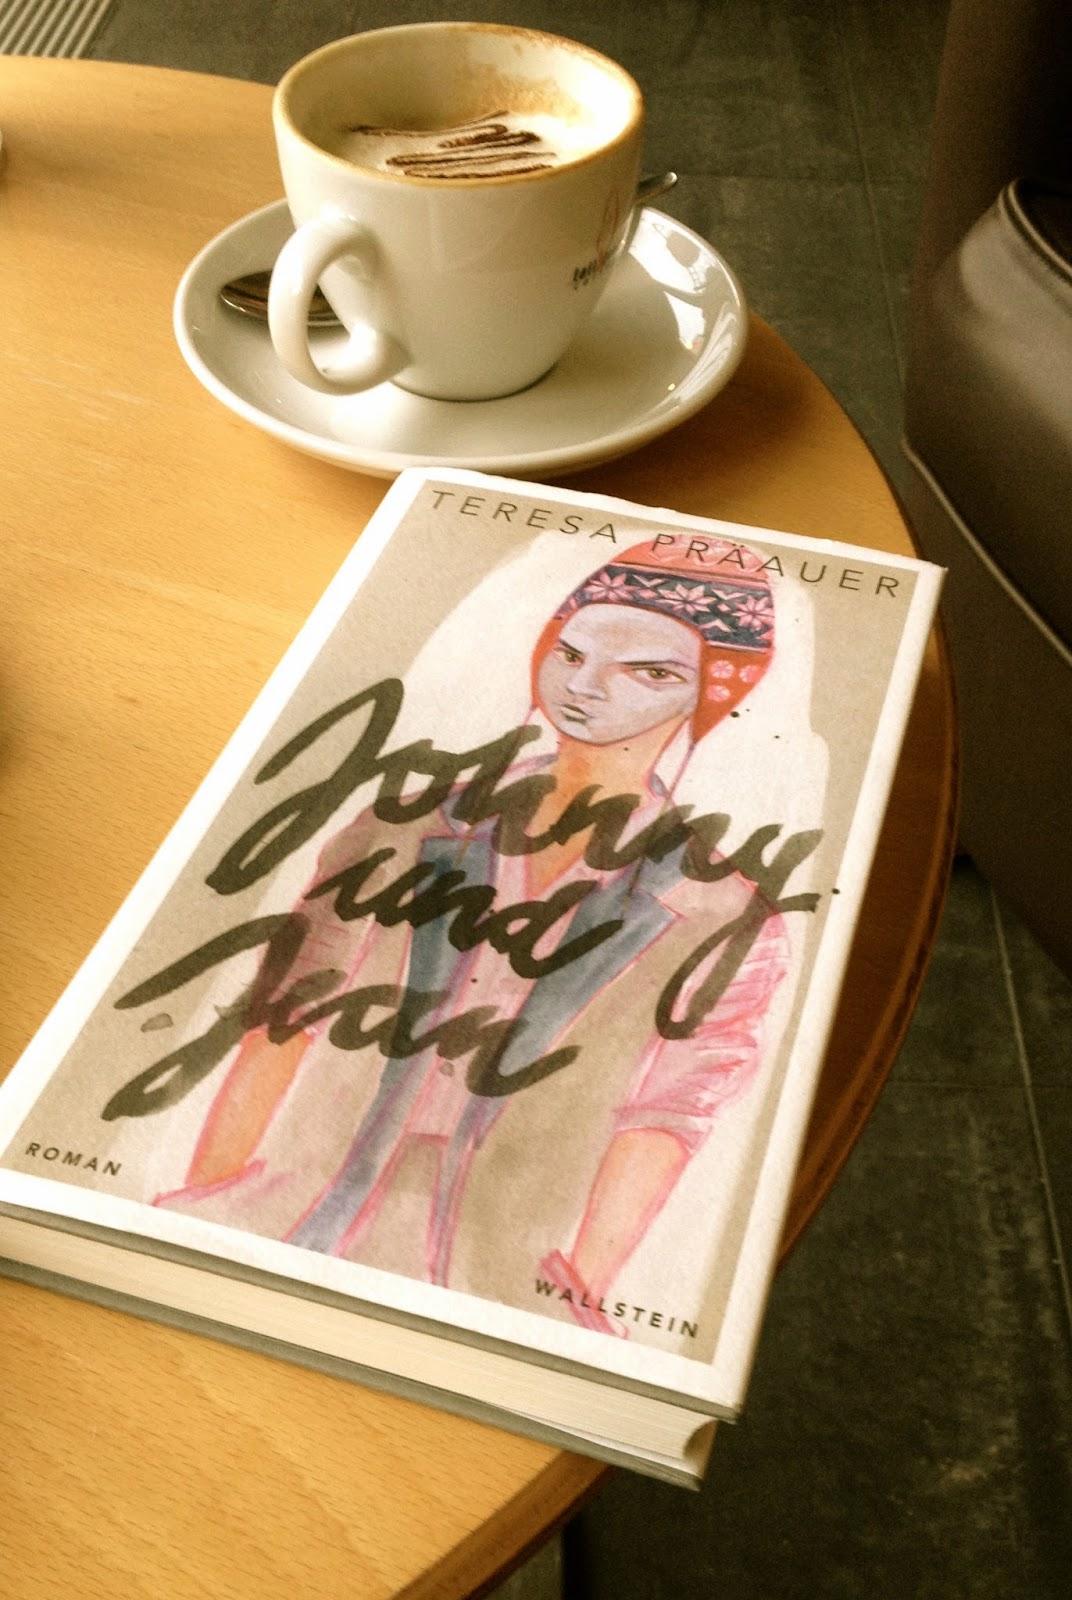 "Teresa Präauers Roman ""Johnny undJean"""